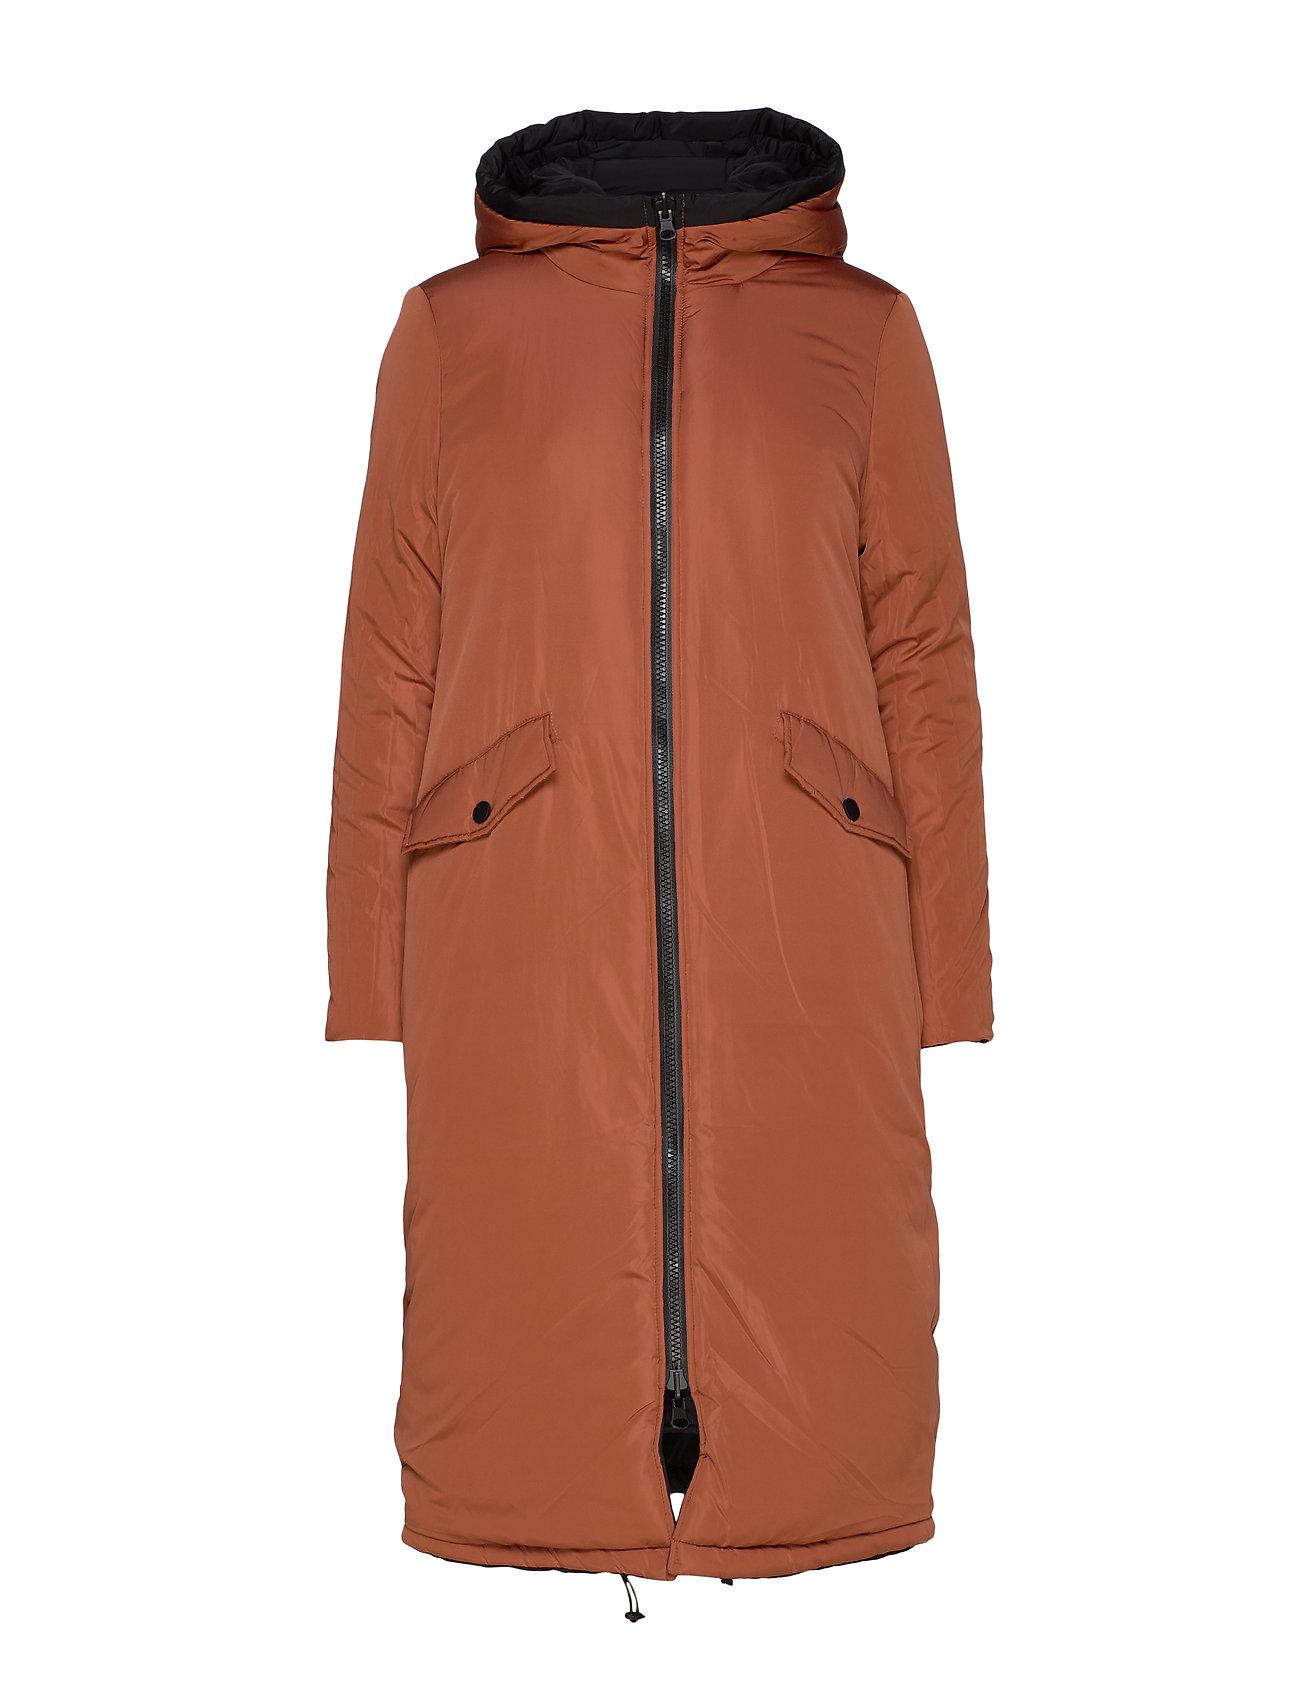 Jacket WBig Pockets Atblackorange Revesible MistCoster Copenhagen 5R34AjL